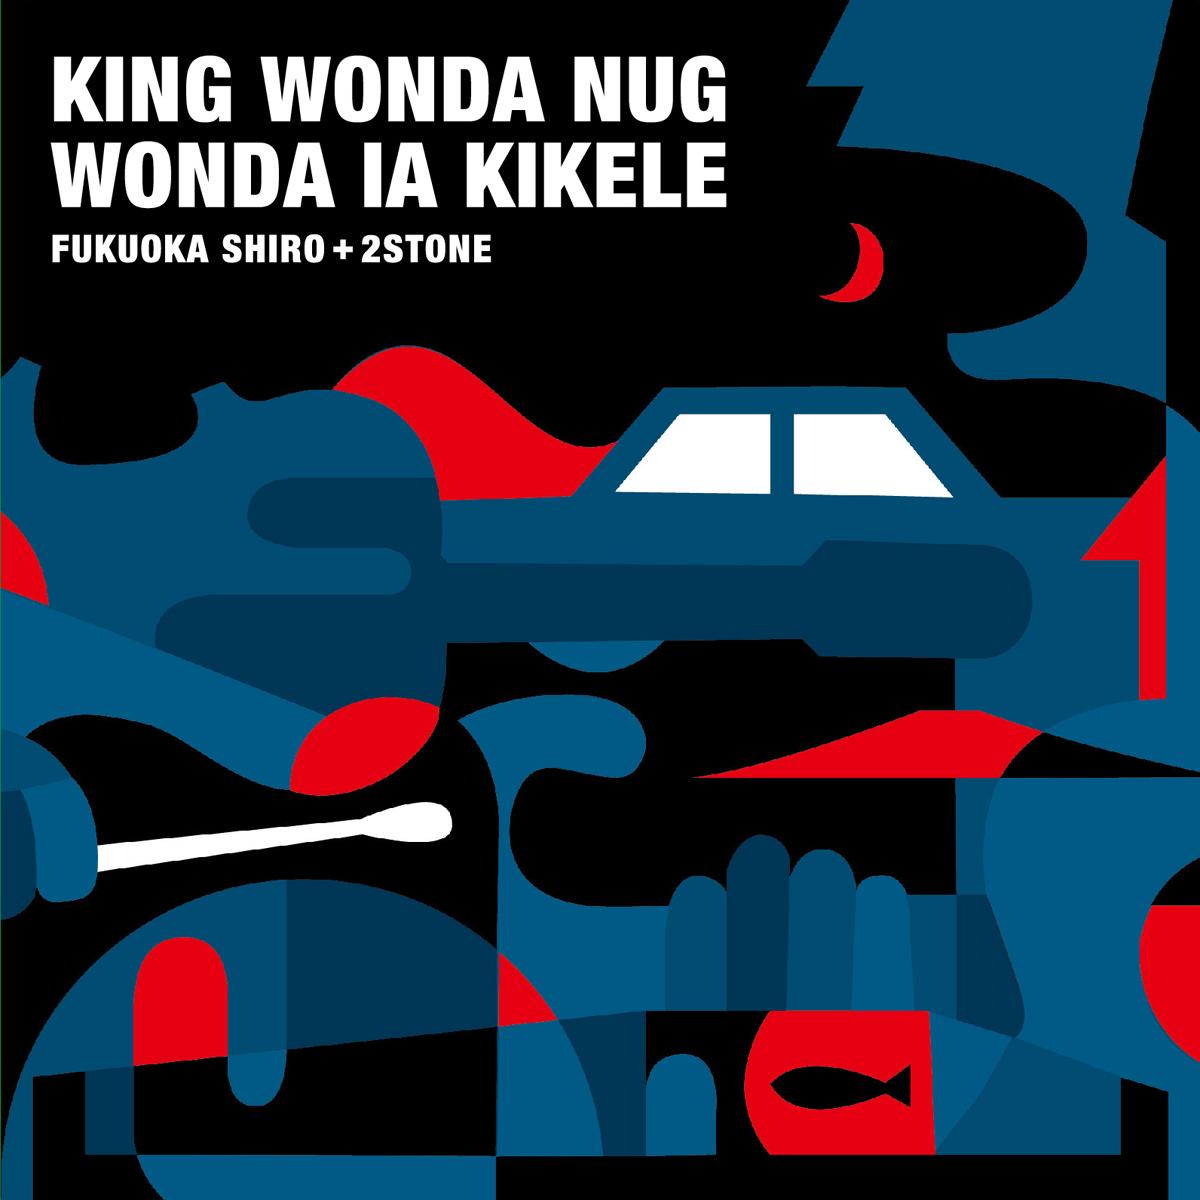 KING WONDA NUG WONDA IA KIKELE /福岡史朗+2STONE